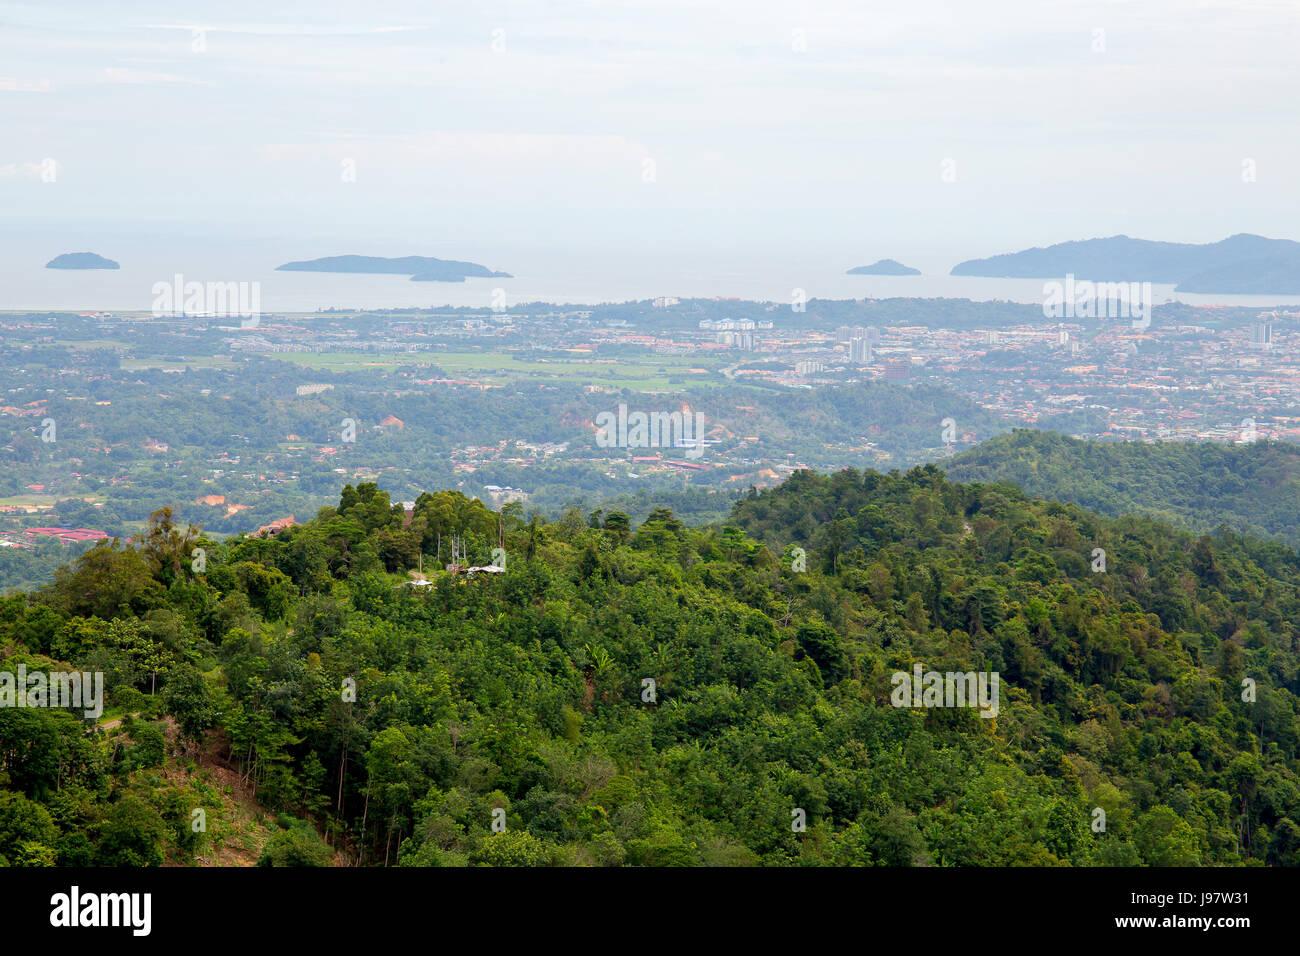 Aerial View of Kota Kinabalu, Sabah, Malesia. - Stock Image